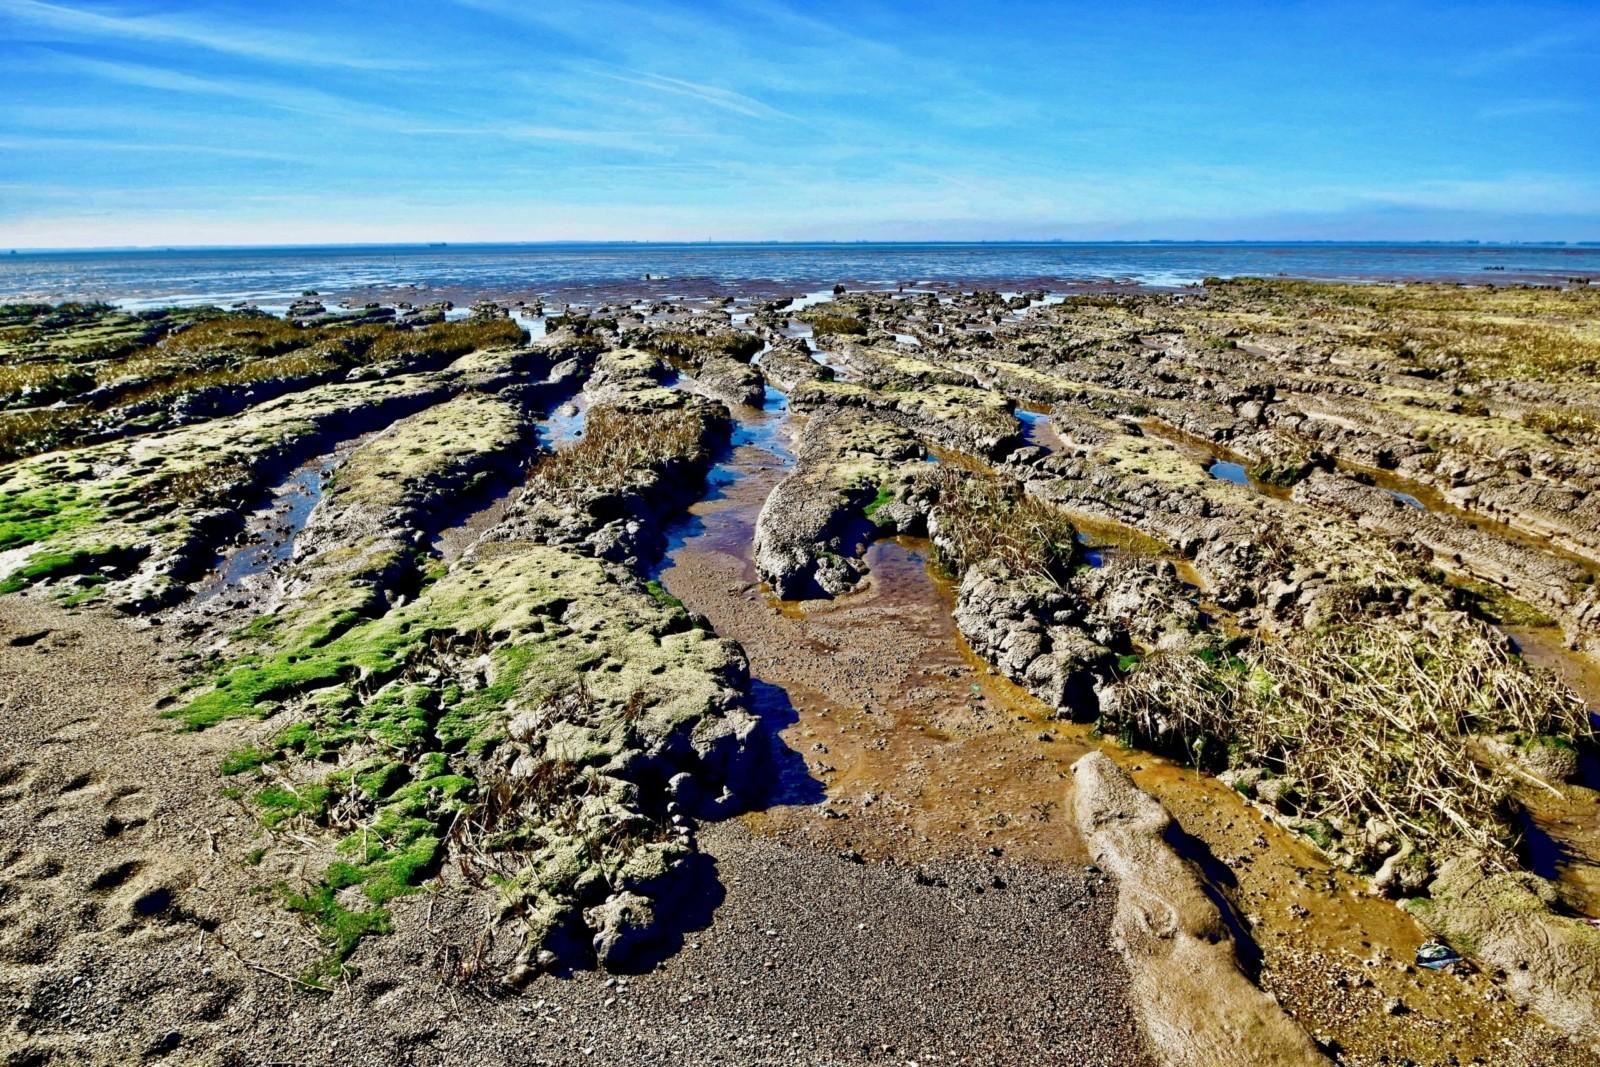 Salt marsh at Spurn Point